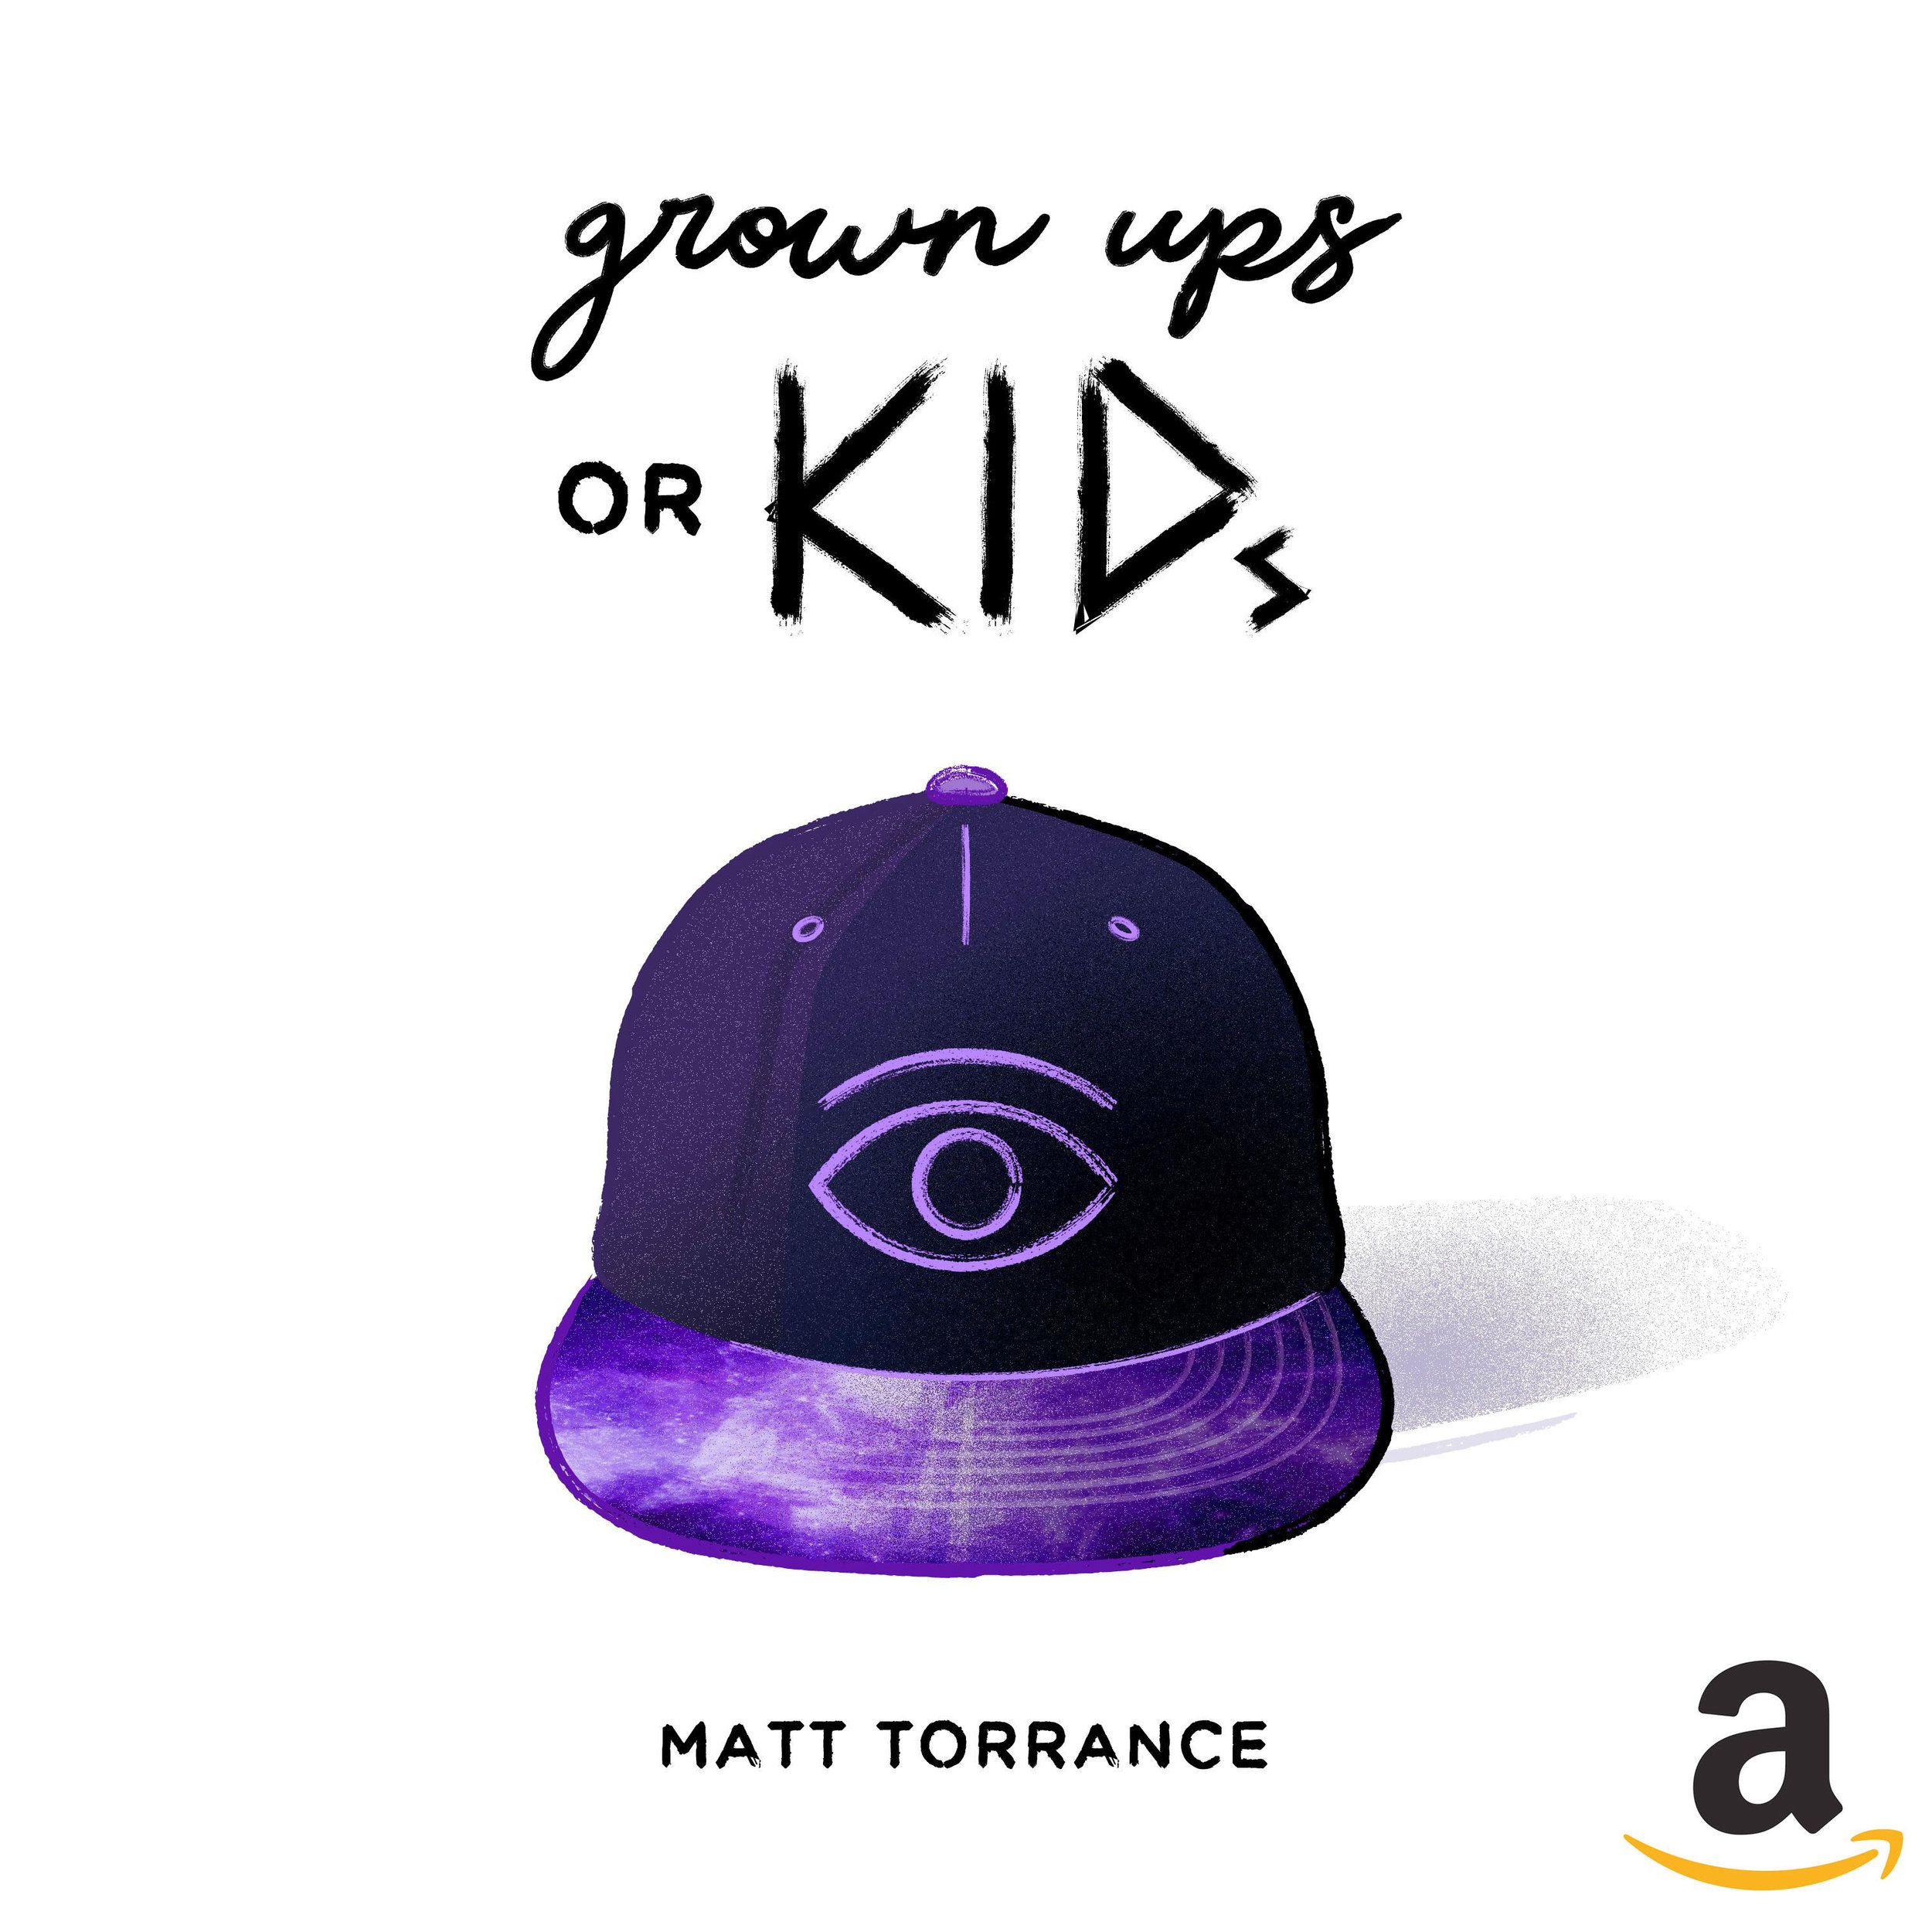 Grownups or Kids Amazon Thumbnail 3000px x 3000px 300dpi.jpg